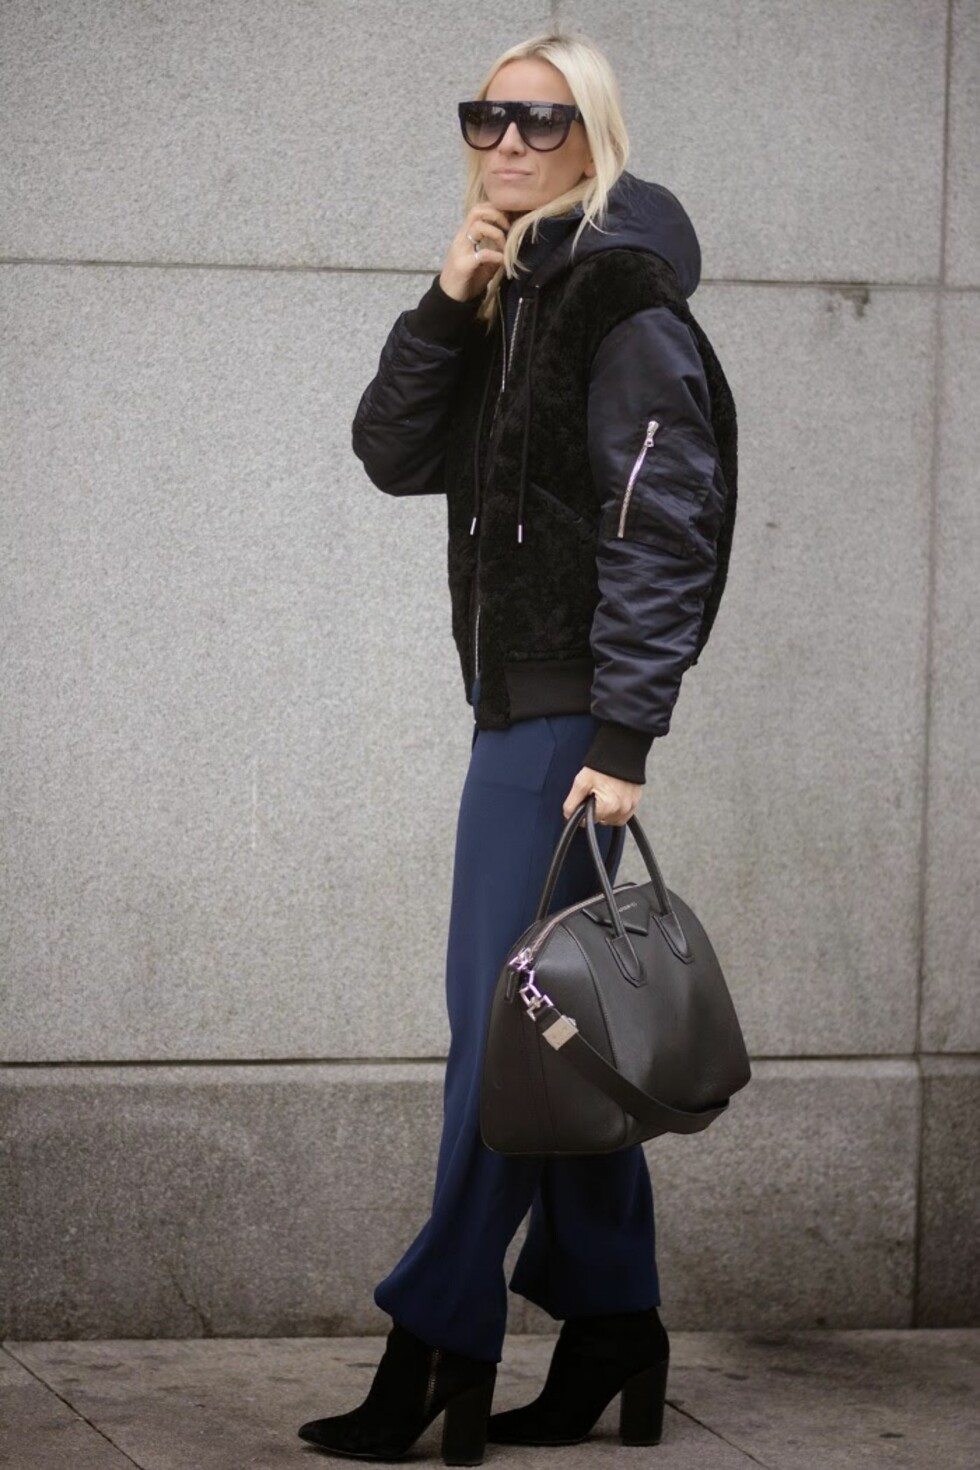 BLÅTT & SVART: Celine kombinerer vinterens trendfarge med den svarte klassikeren.  Foto: Hippiehippiemilkshake.blogspot.no